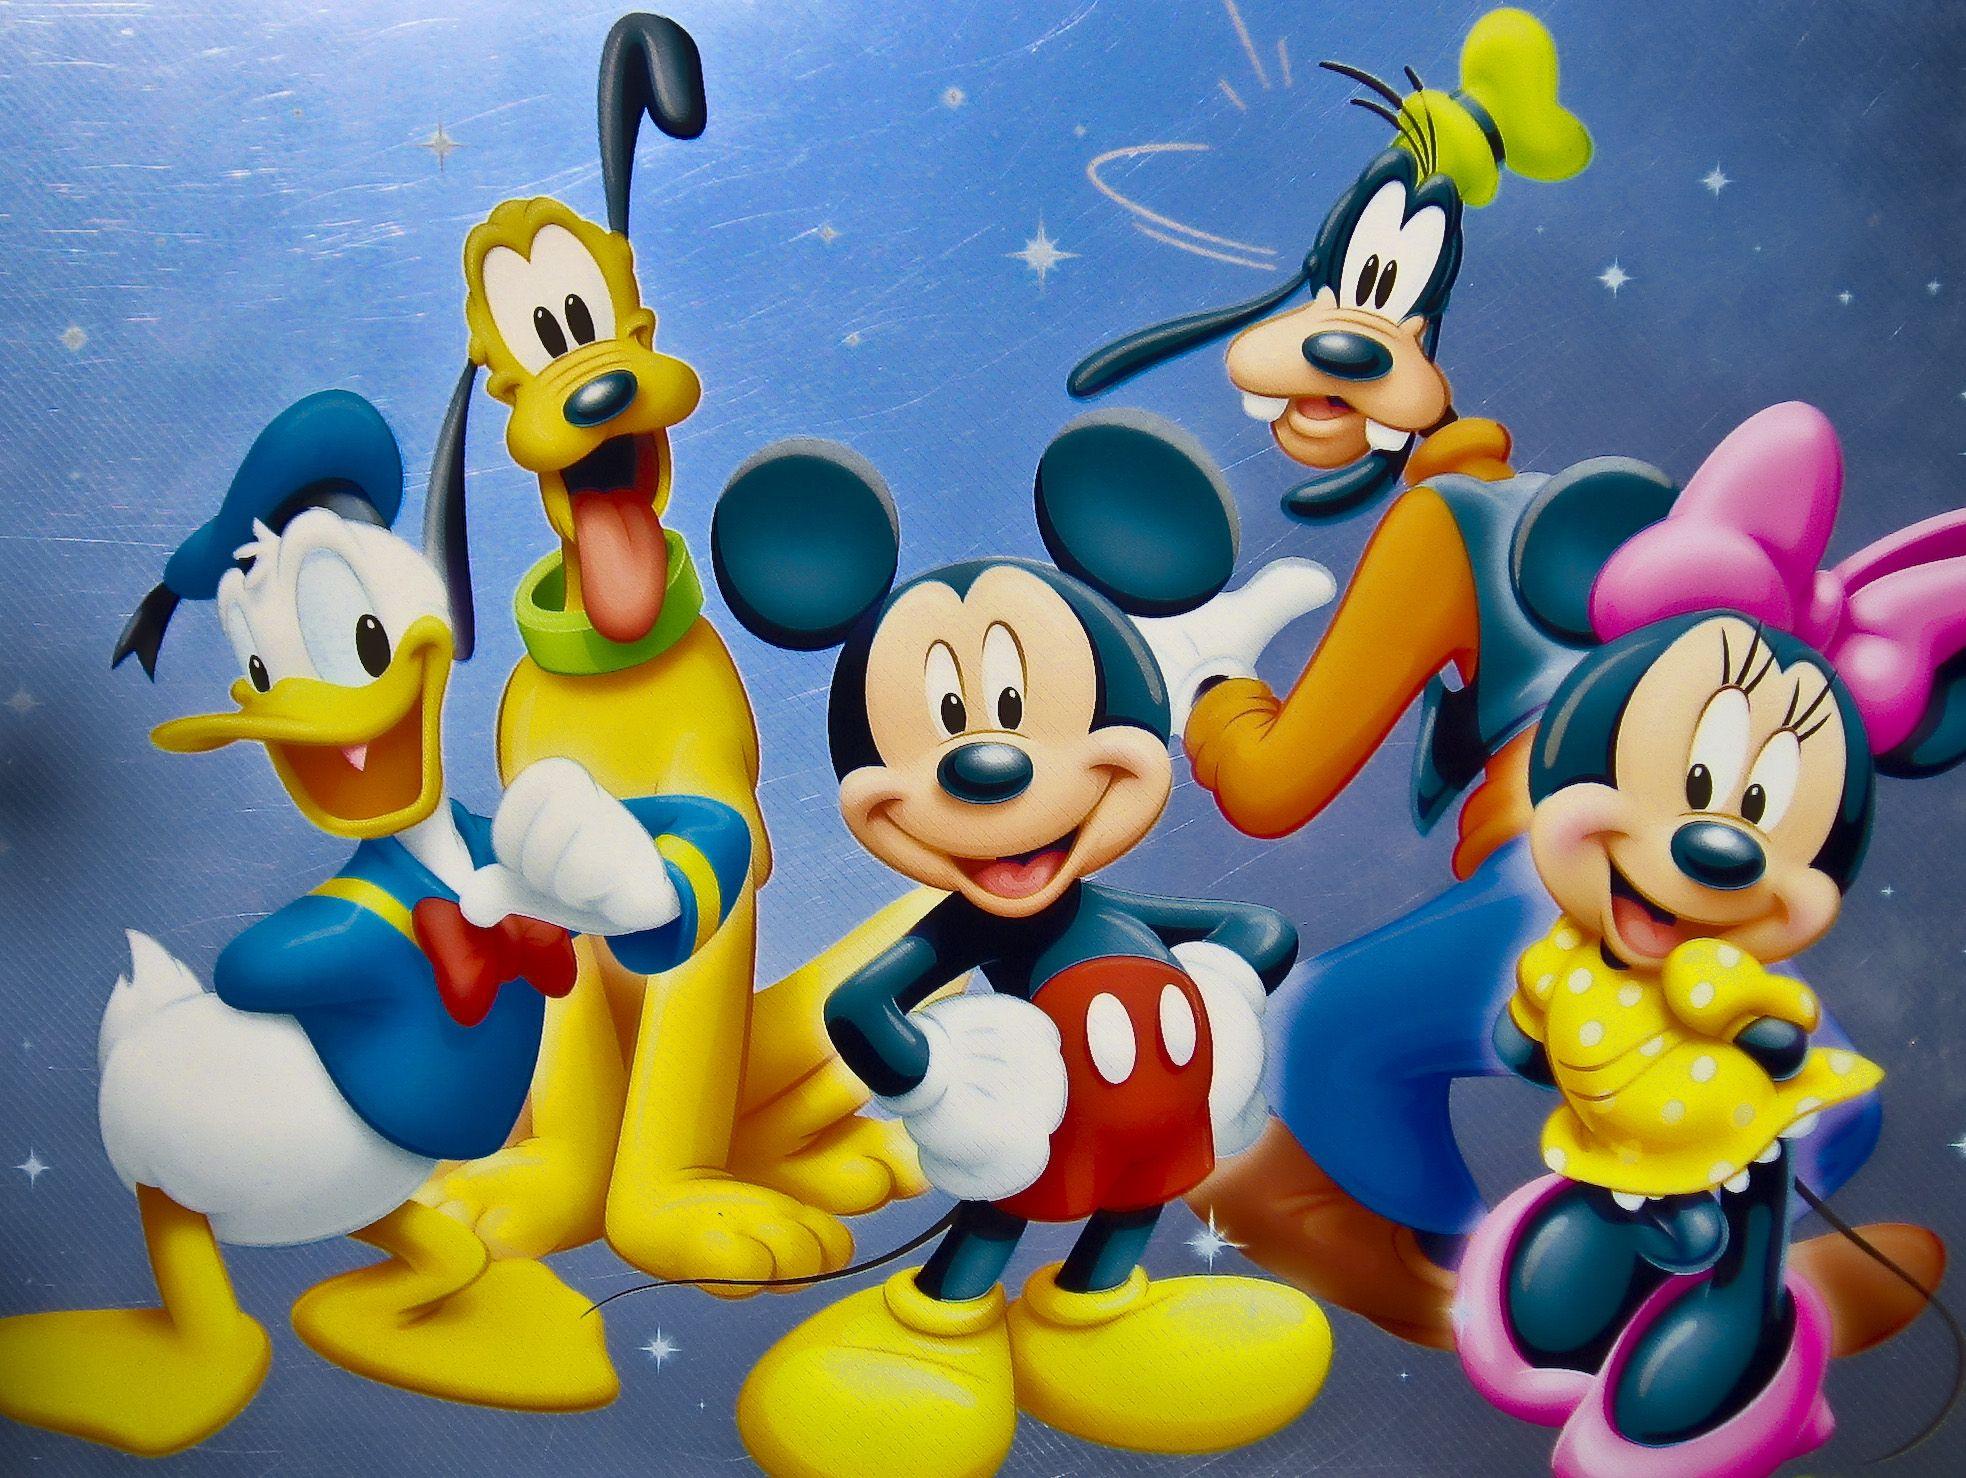 Cute Stitch Wallpapers For Computer Screen Disney Character Wallpapers Hd Pixelstalk Net